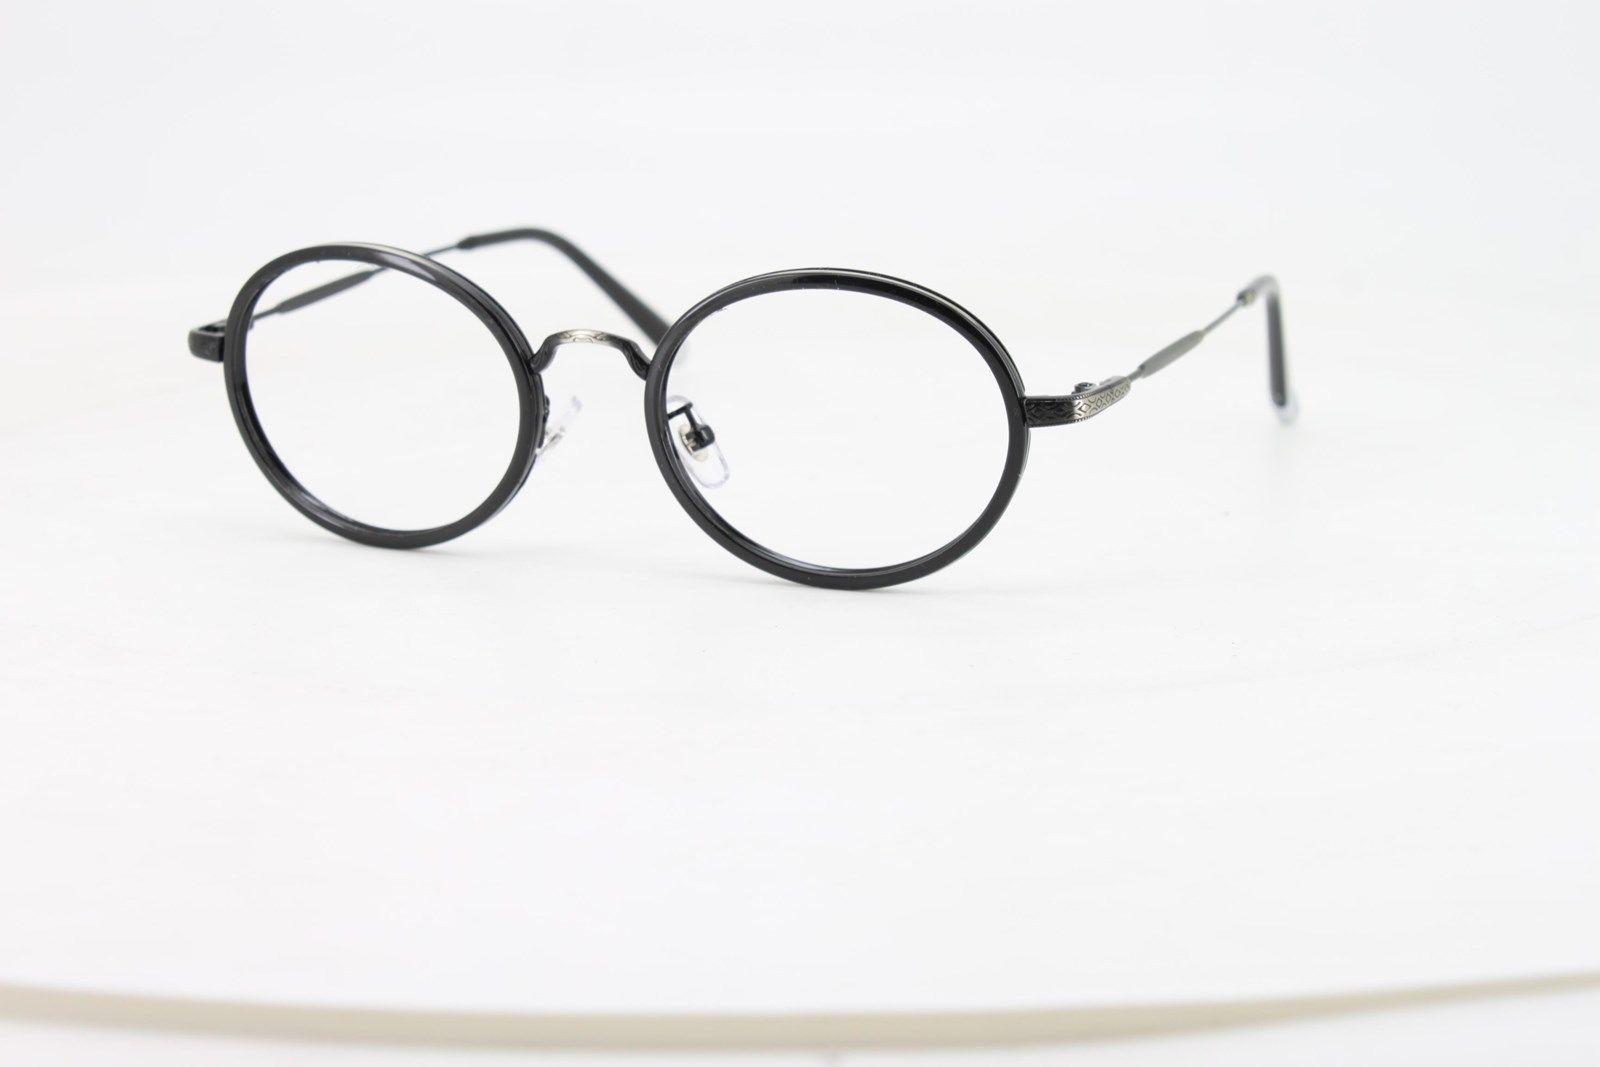 e45418c7765 S l1600. S l1600. Previous. Ebe Bifocal Reading Glasses Mens Womens Gloss  Black Full Frame Oval Round